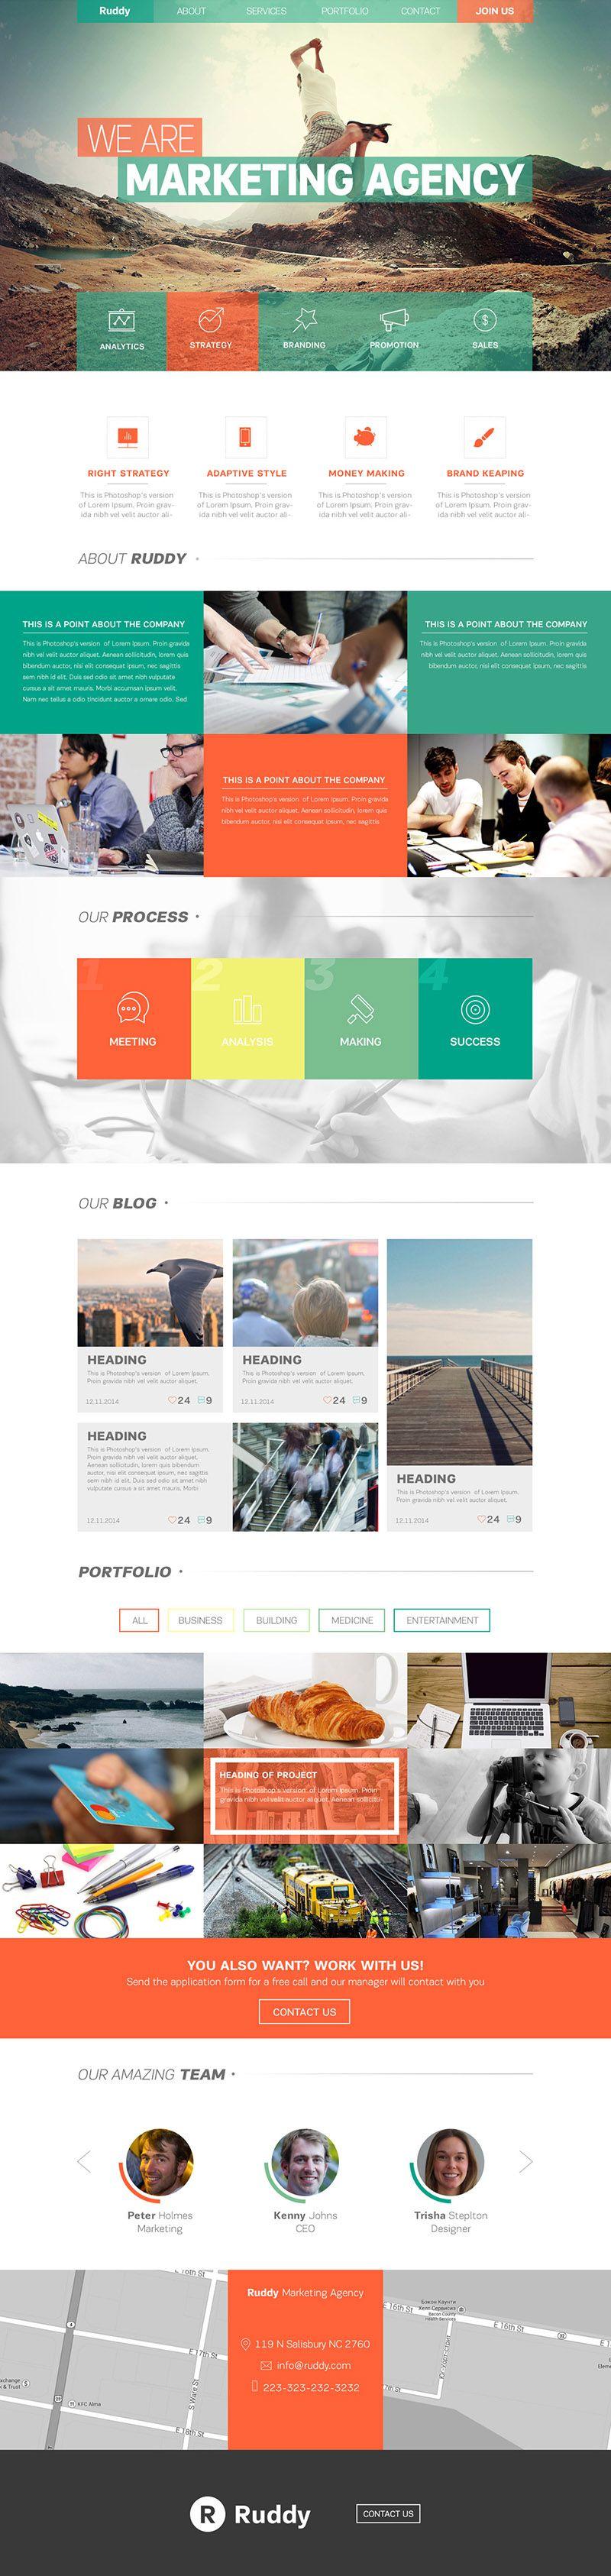 Clean One Page Website Theme Web Development Design Web Layout Design Web Design Inspiration